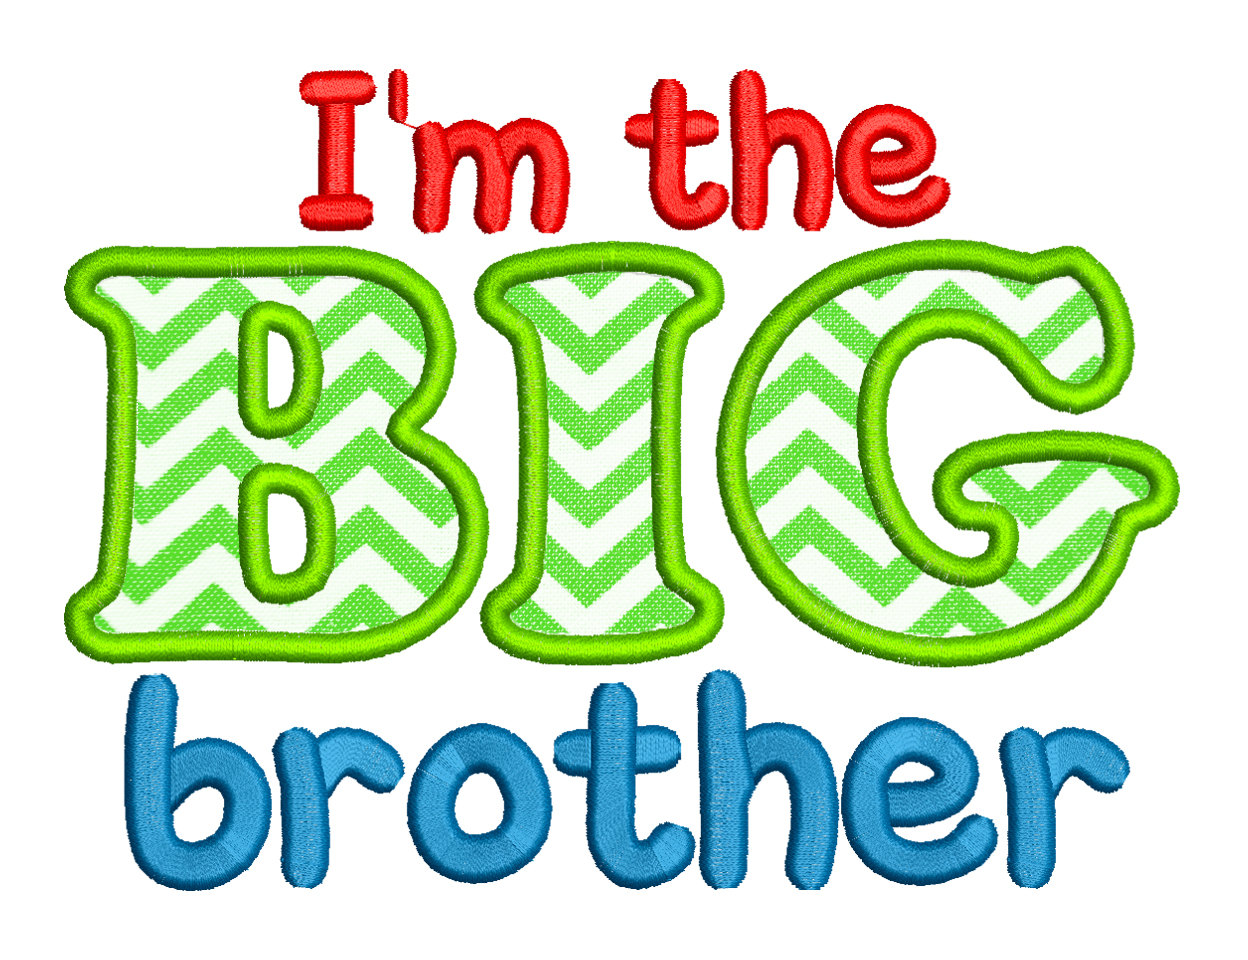 Big brother design.